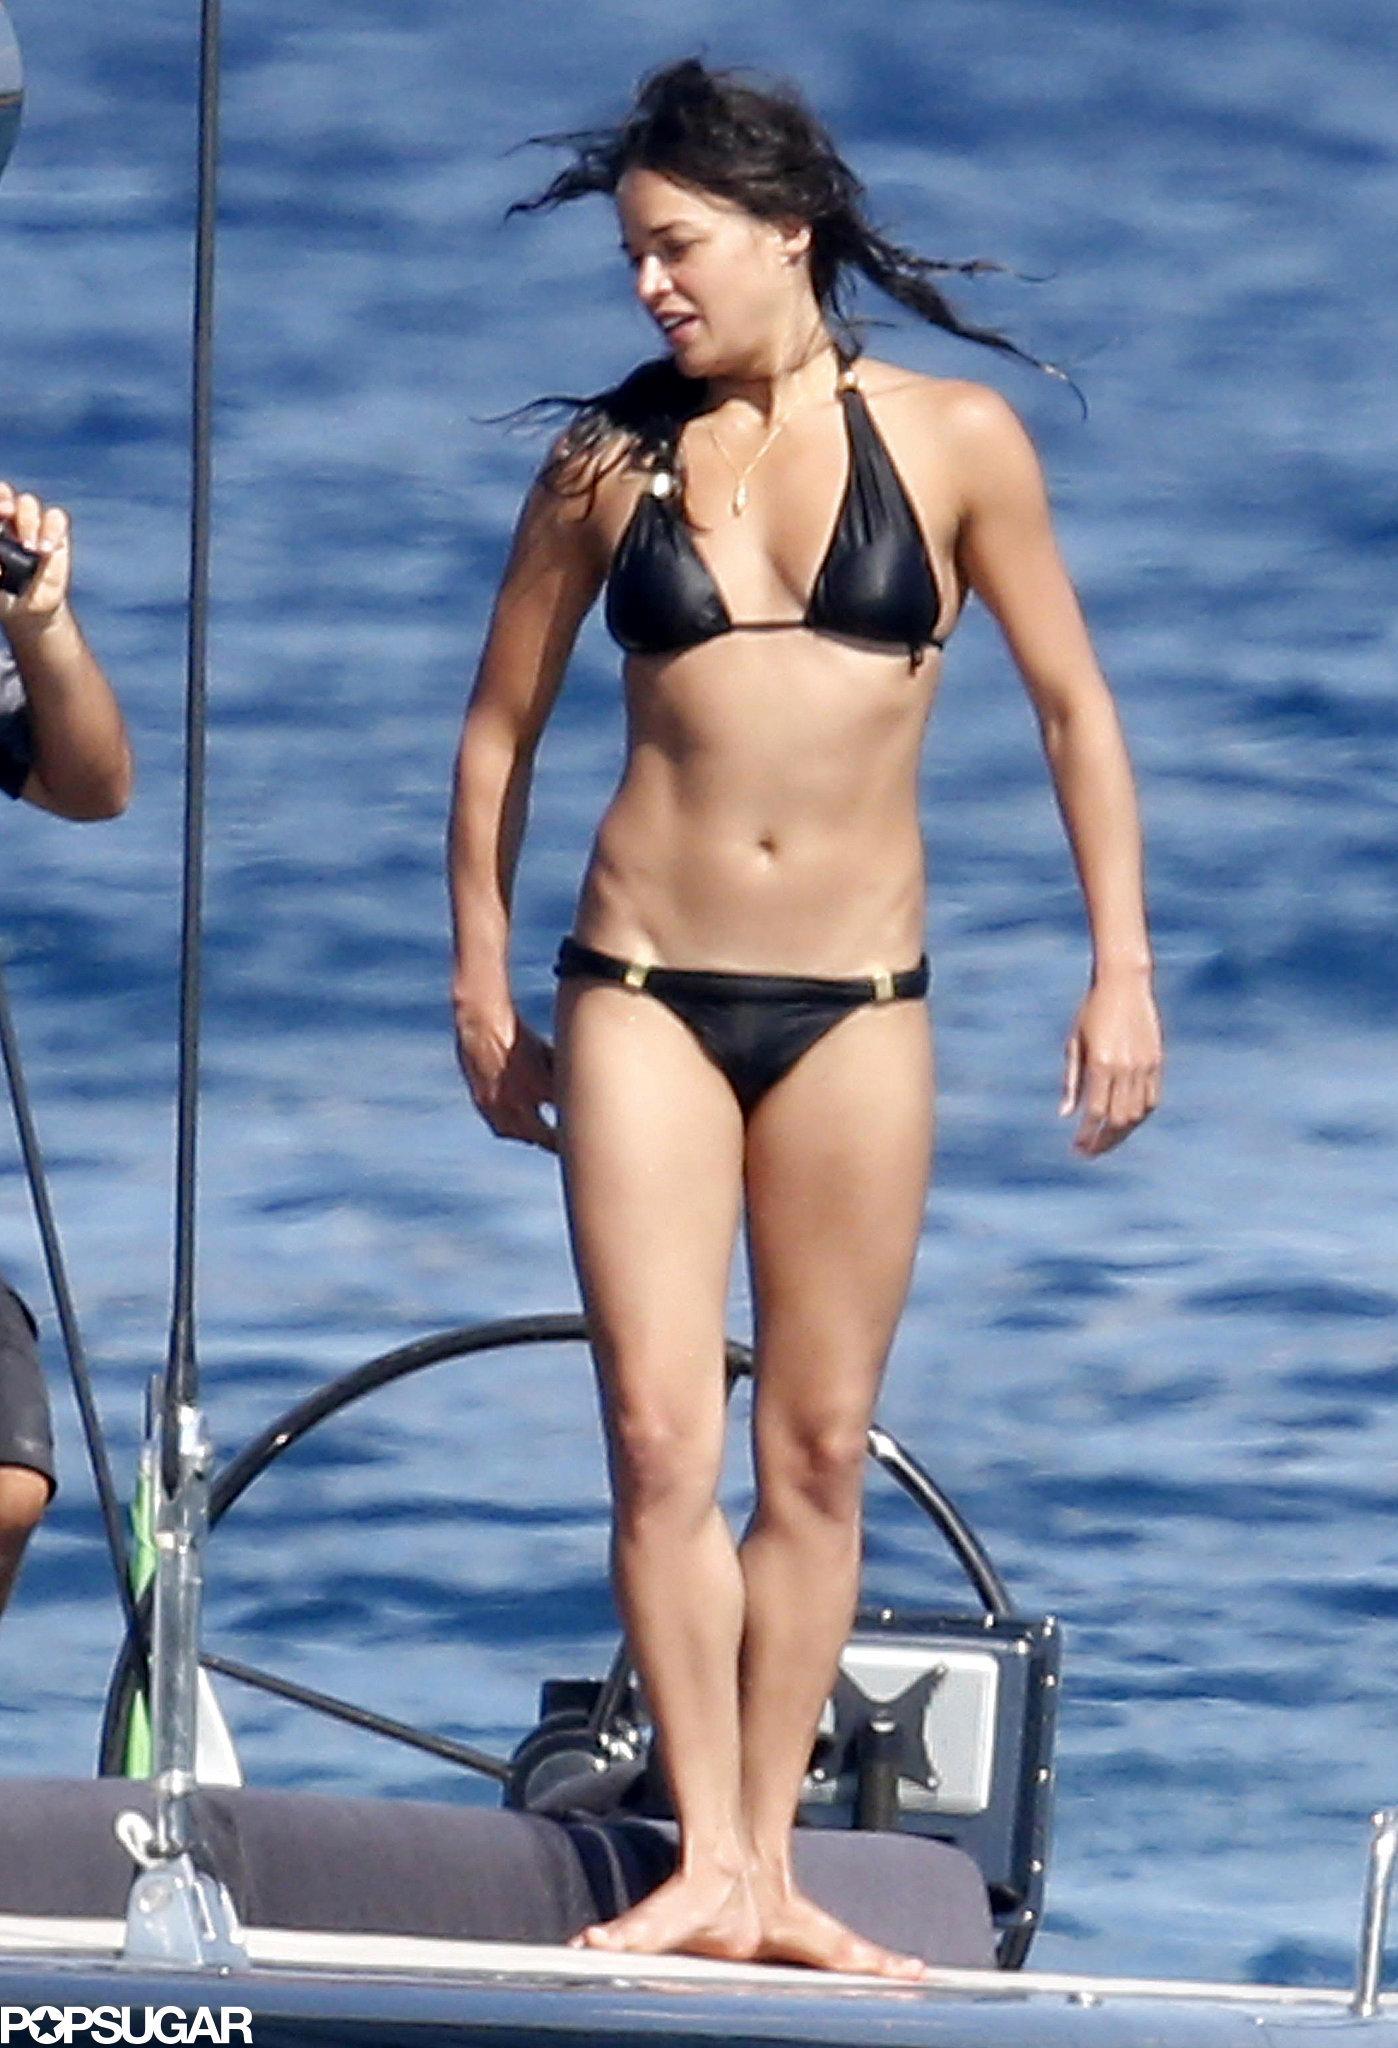 Michelle Rodriguez Bikini Bodies Pic 11 of 35